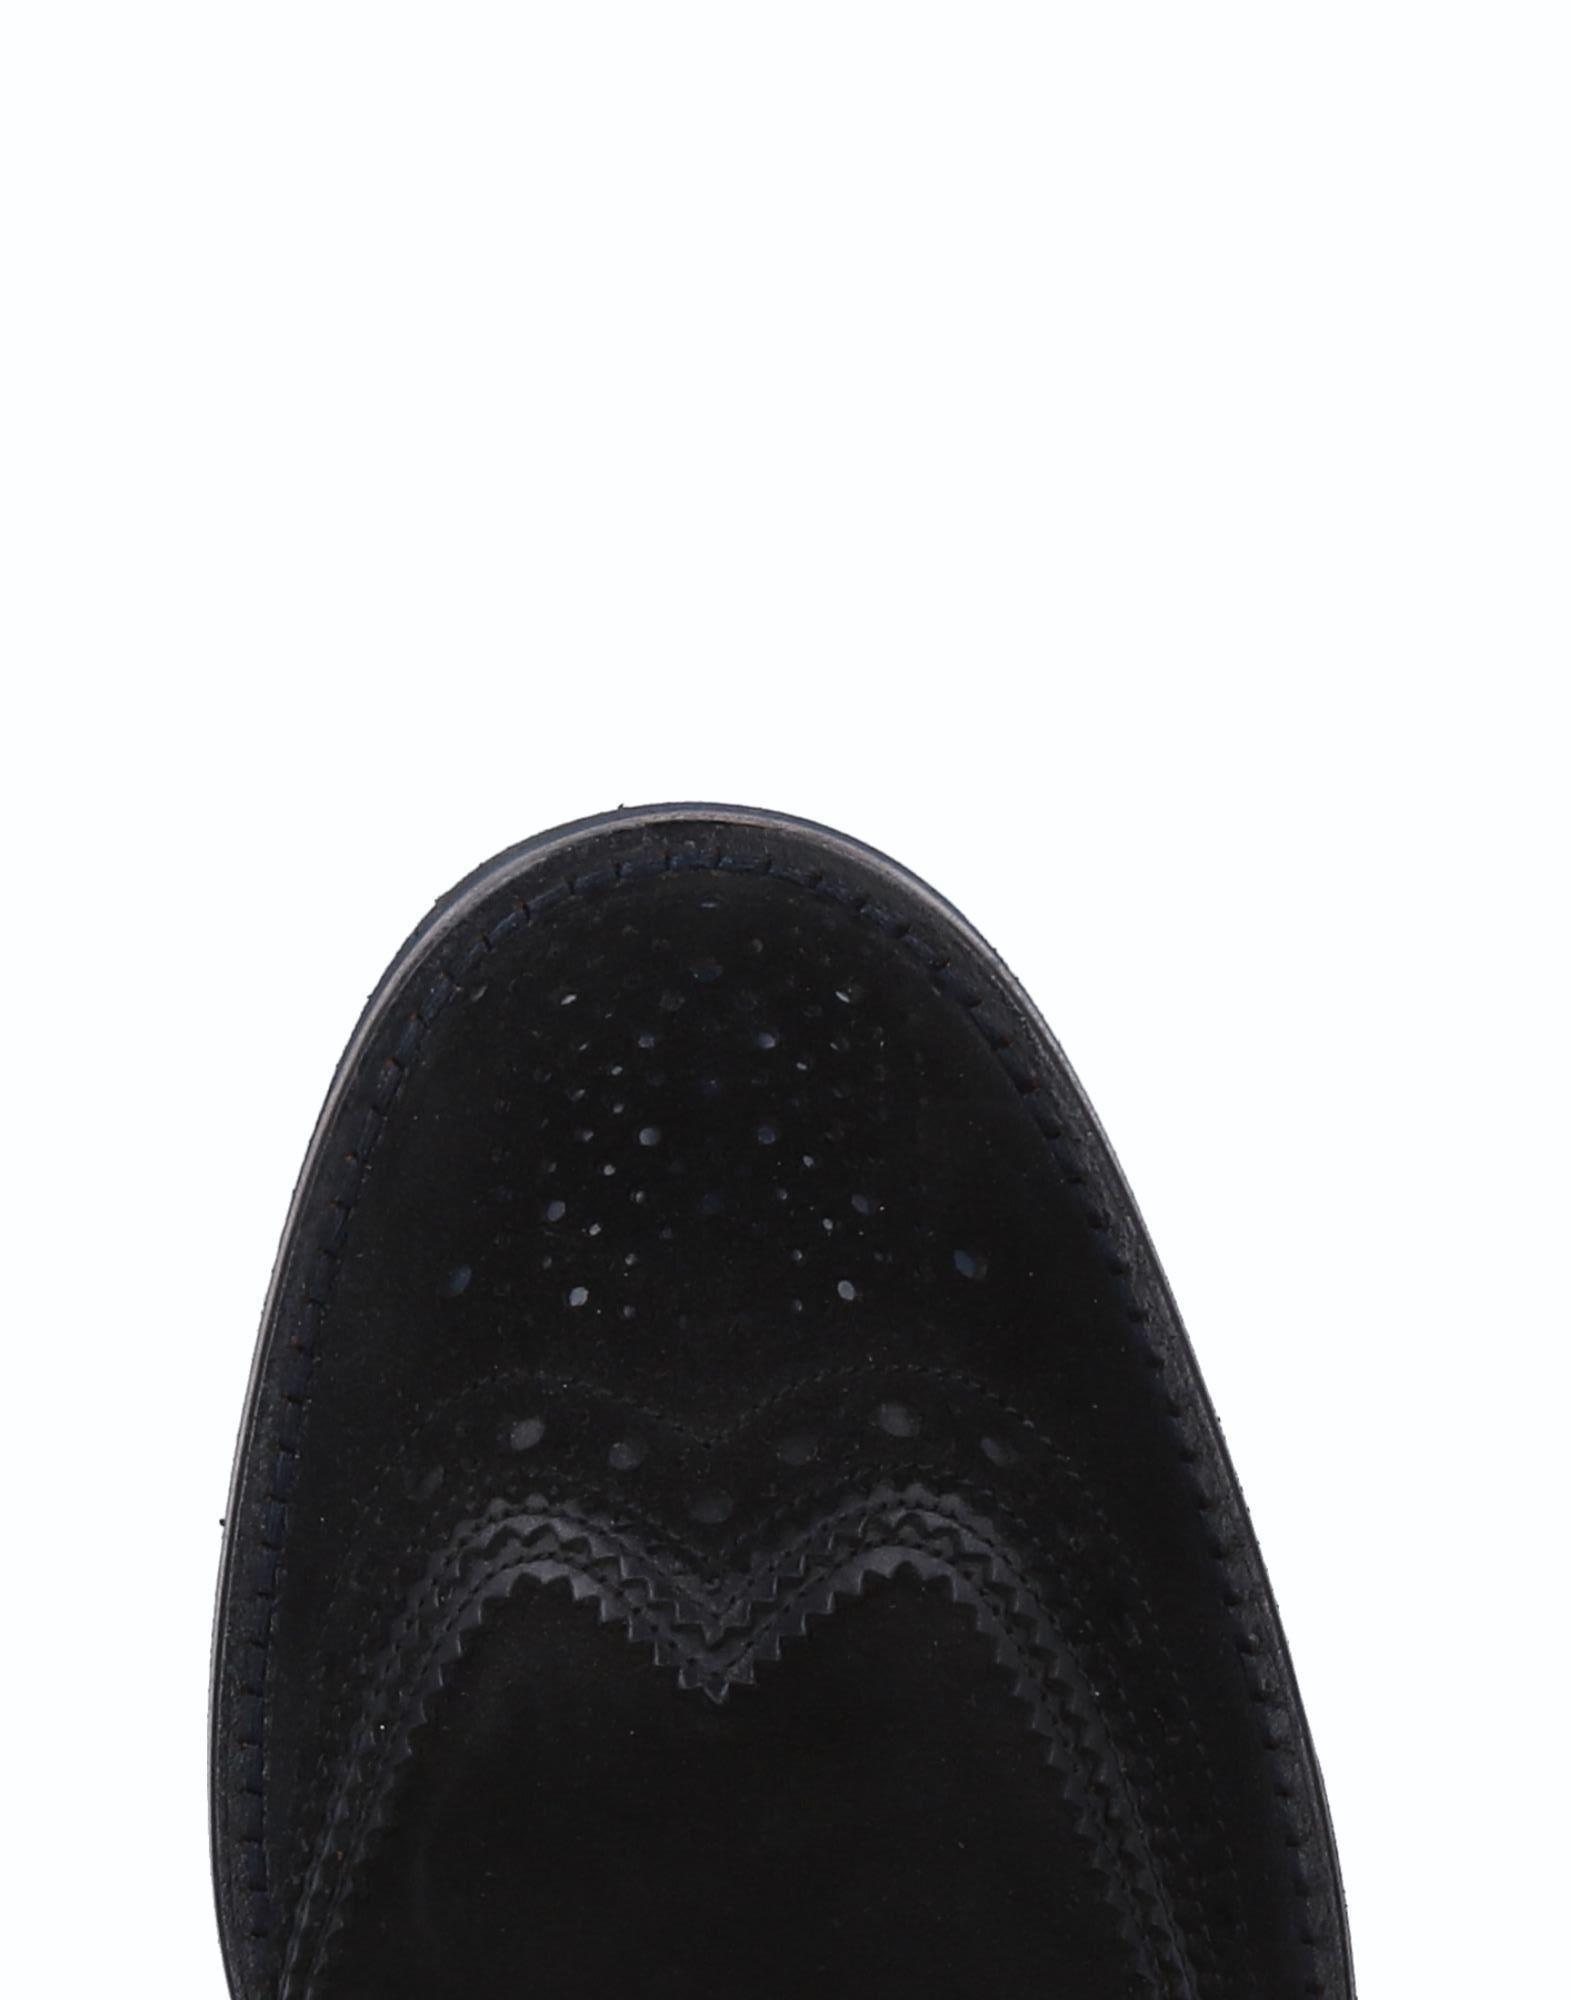 Brimarts Schnürschuhe Schuhe Herren  11504318QD Heiße Schuhe Schnürschuhe e26be4